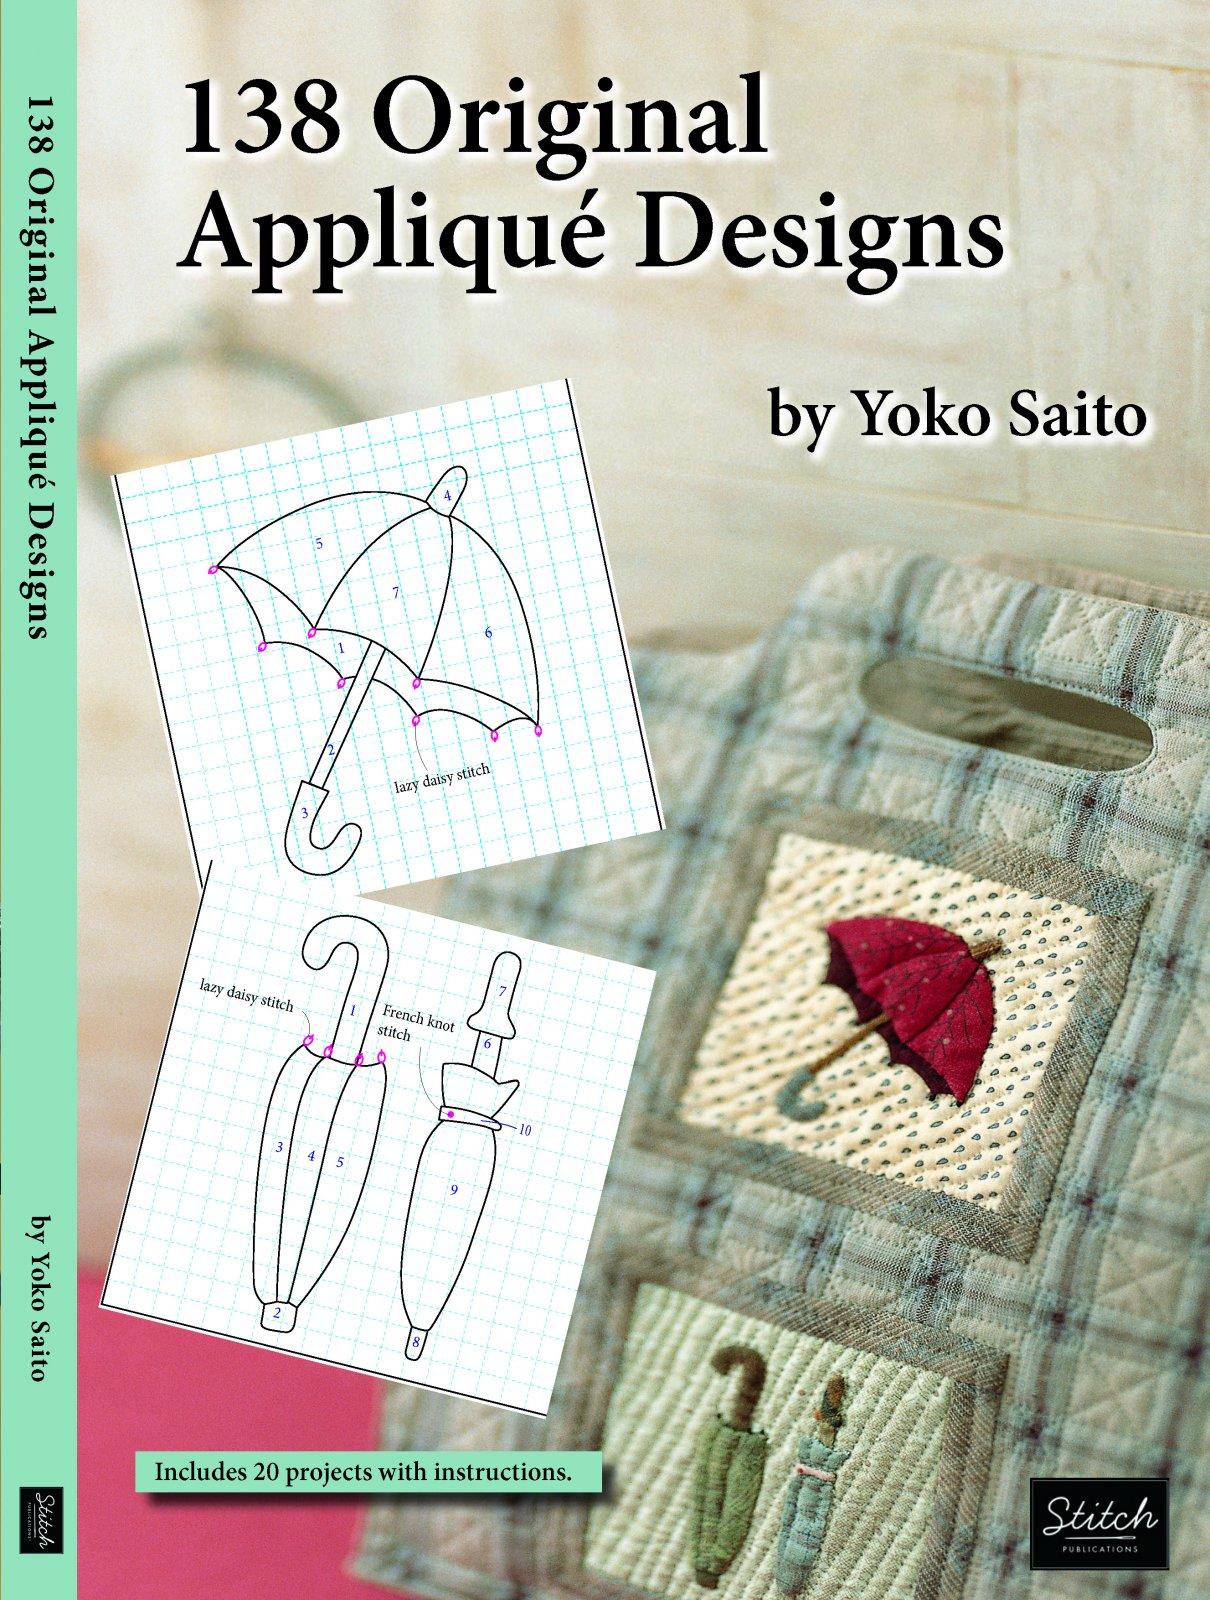 Yoko Saito Book:  138 Original Applique Designs - Explore and Create